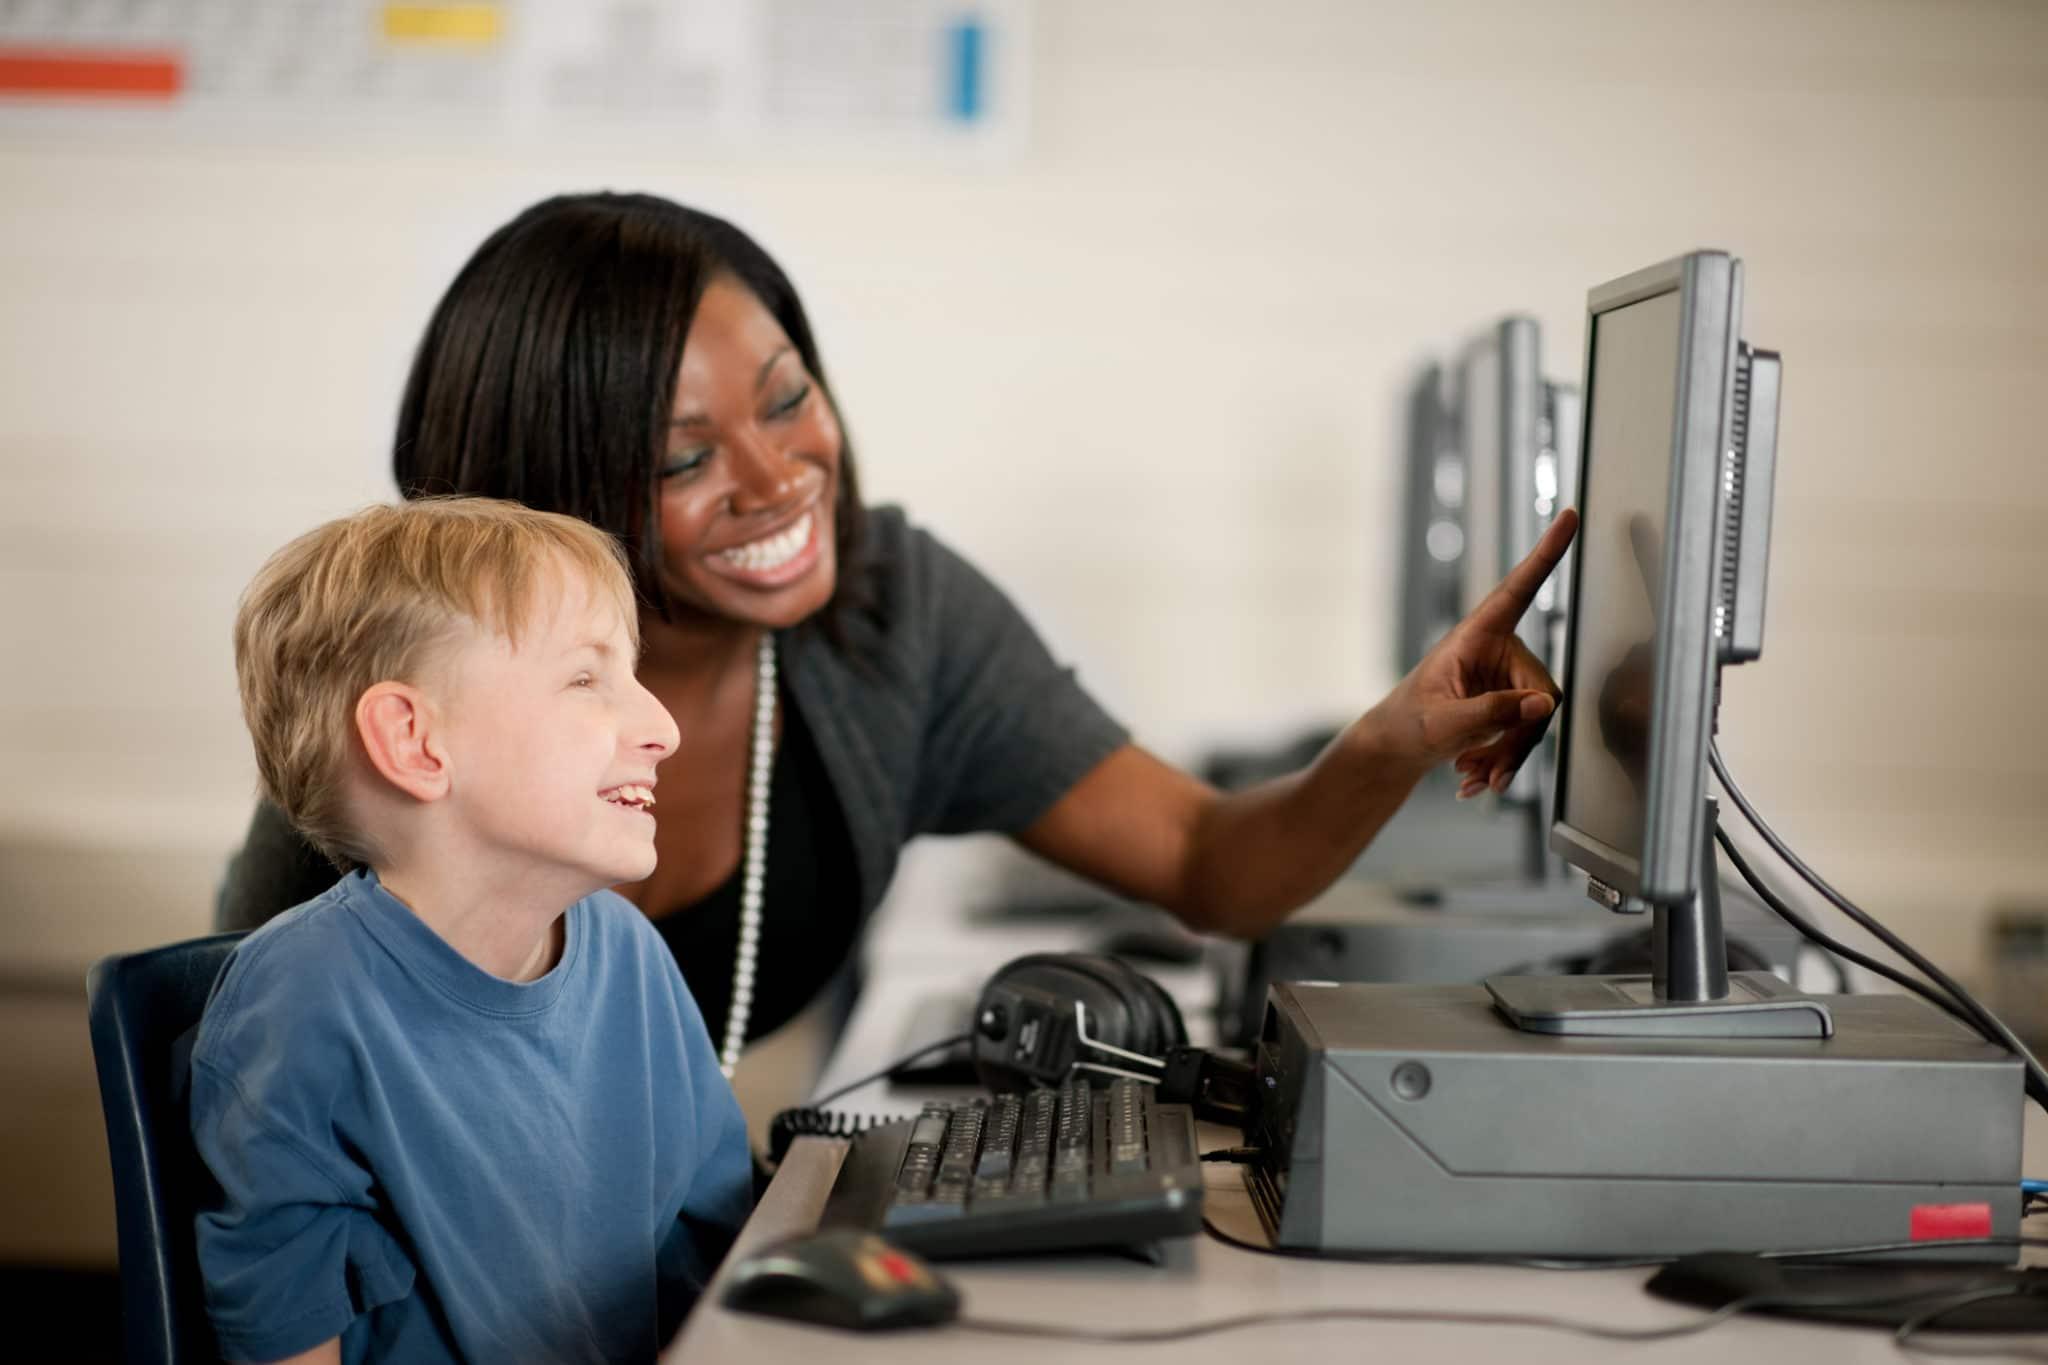 Ohio Organization For Developmental Disabilities Receiving IT Services